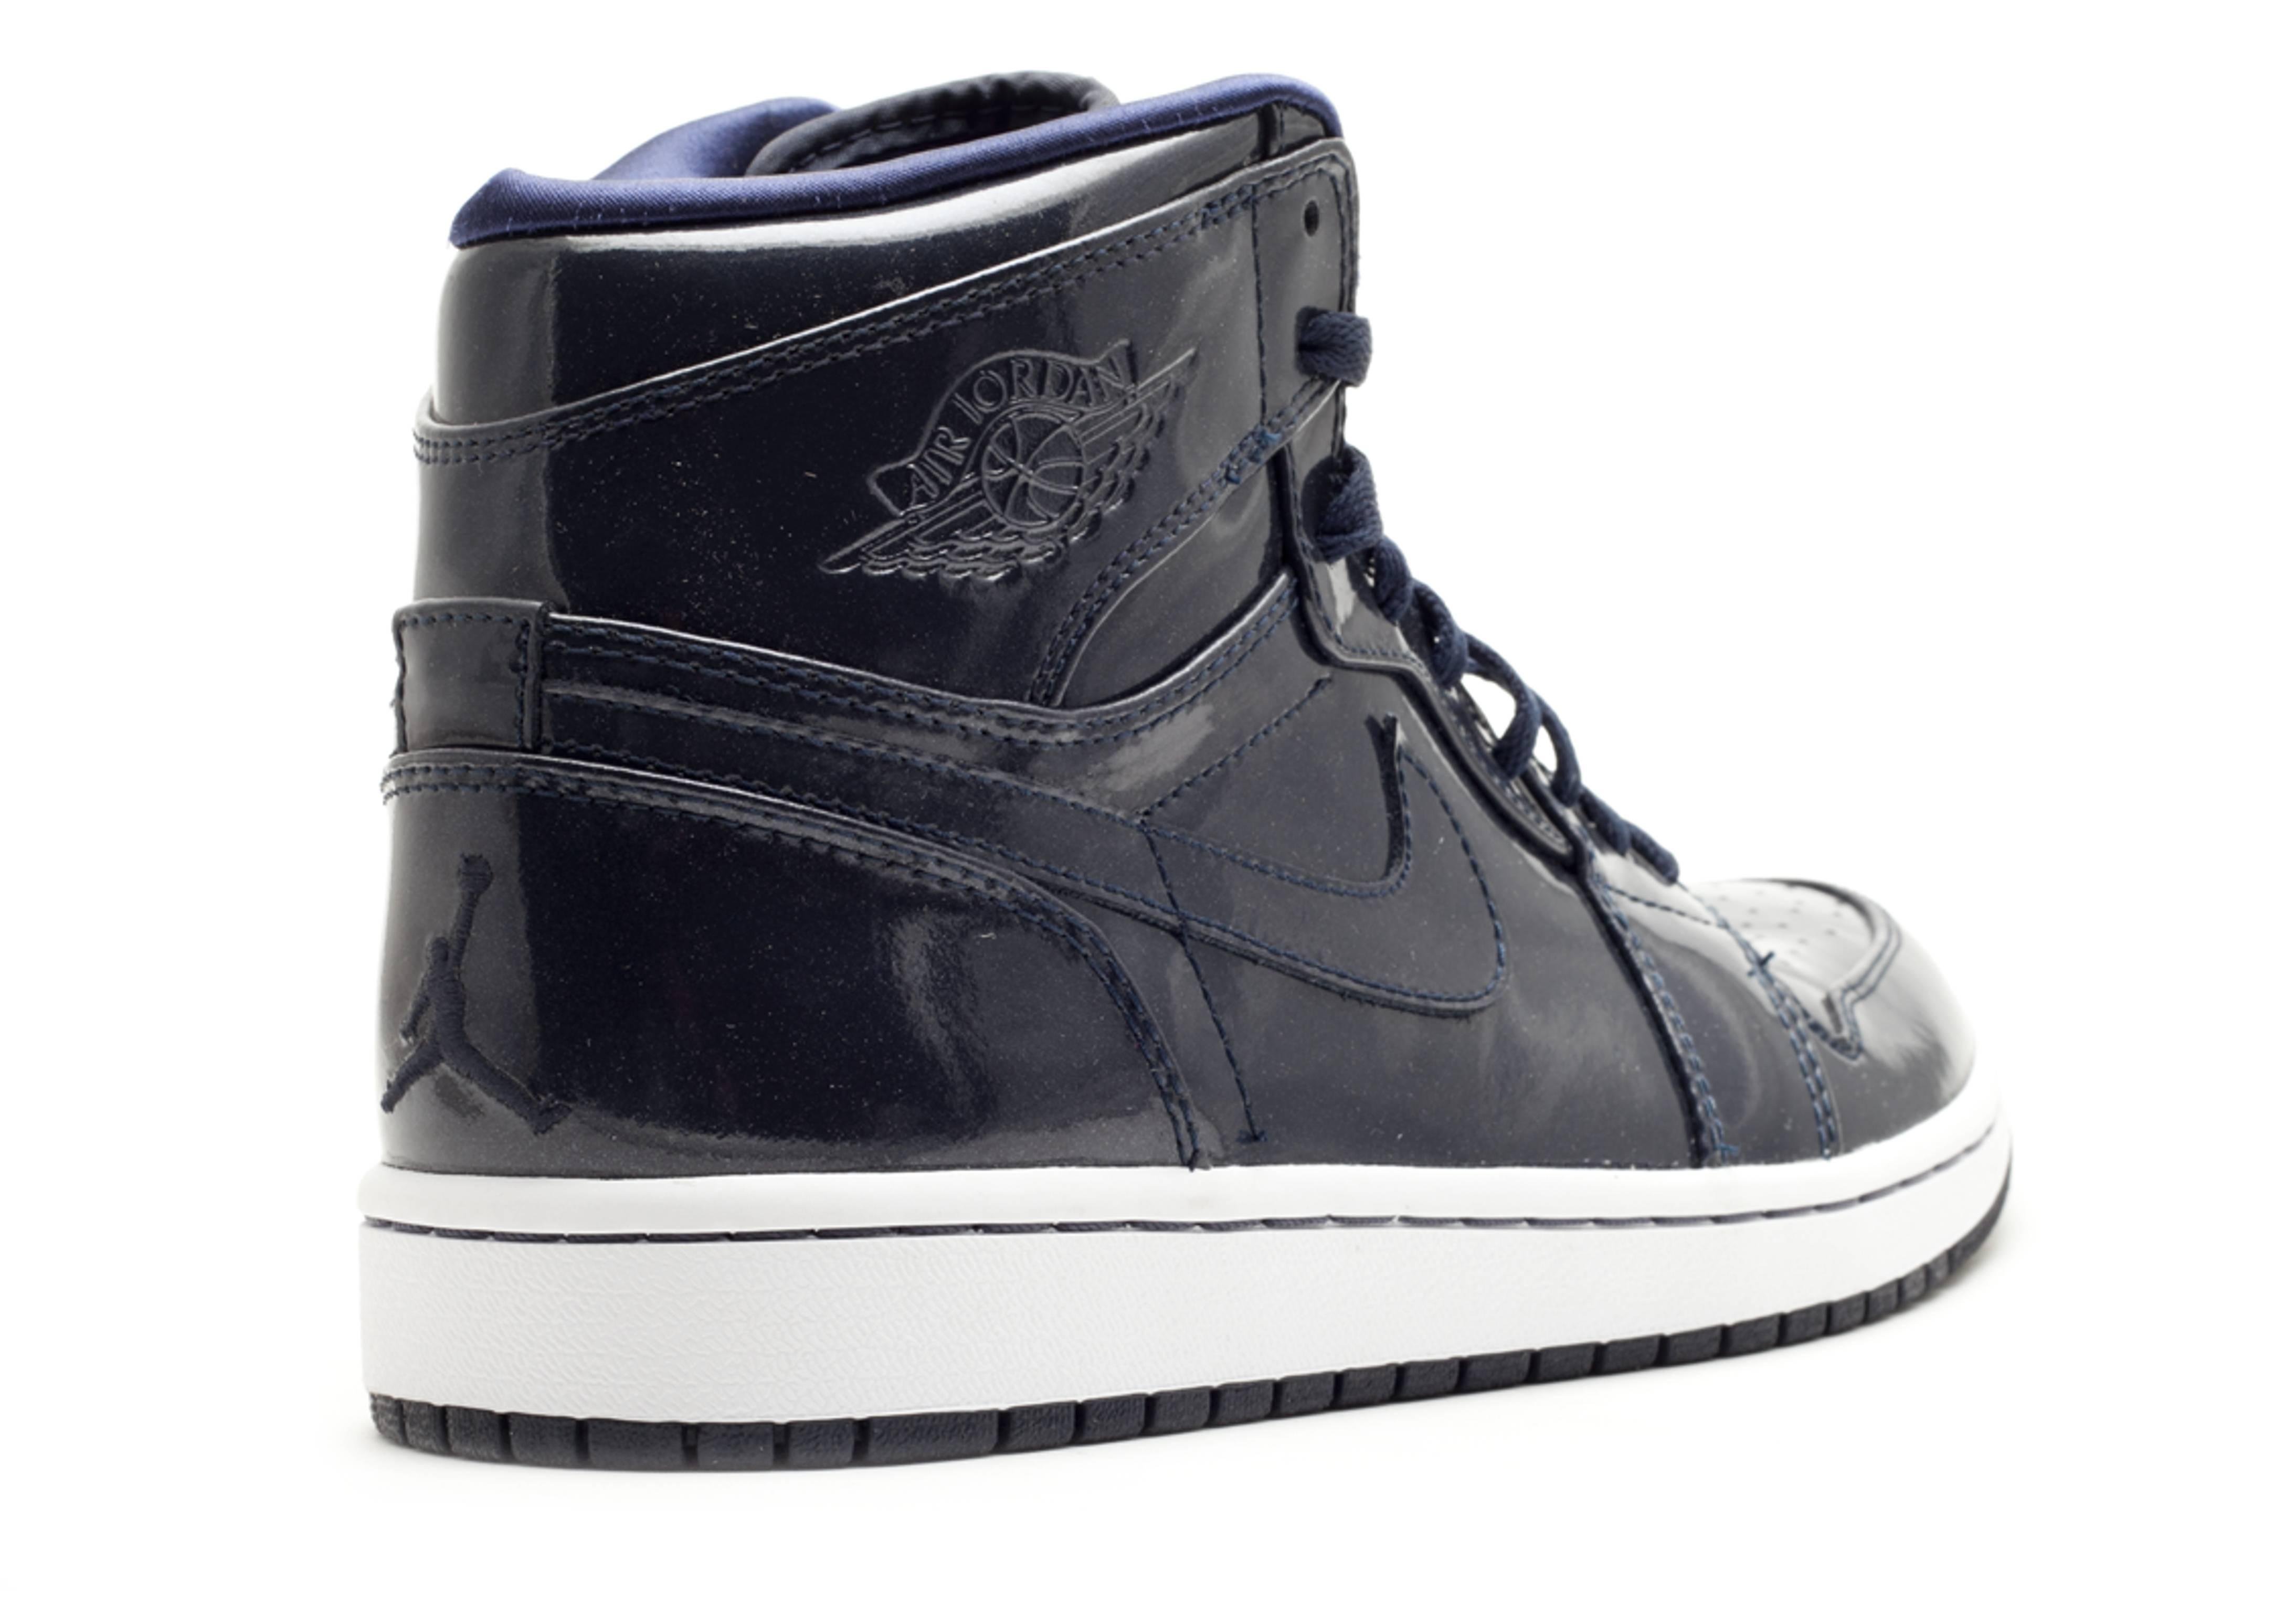 brand new da5a9 e46f5 Air Jordan 1 Retro High - Air Jordan - 332550 441 - dark obisidian drk  obsidian-wht   Flight Club